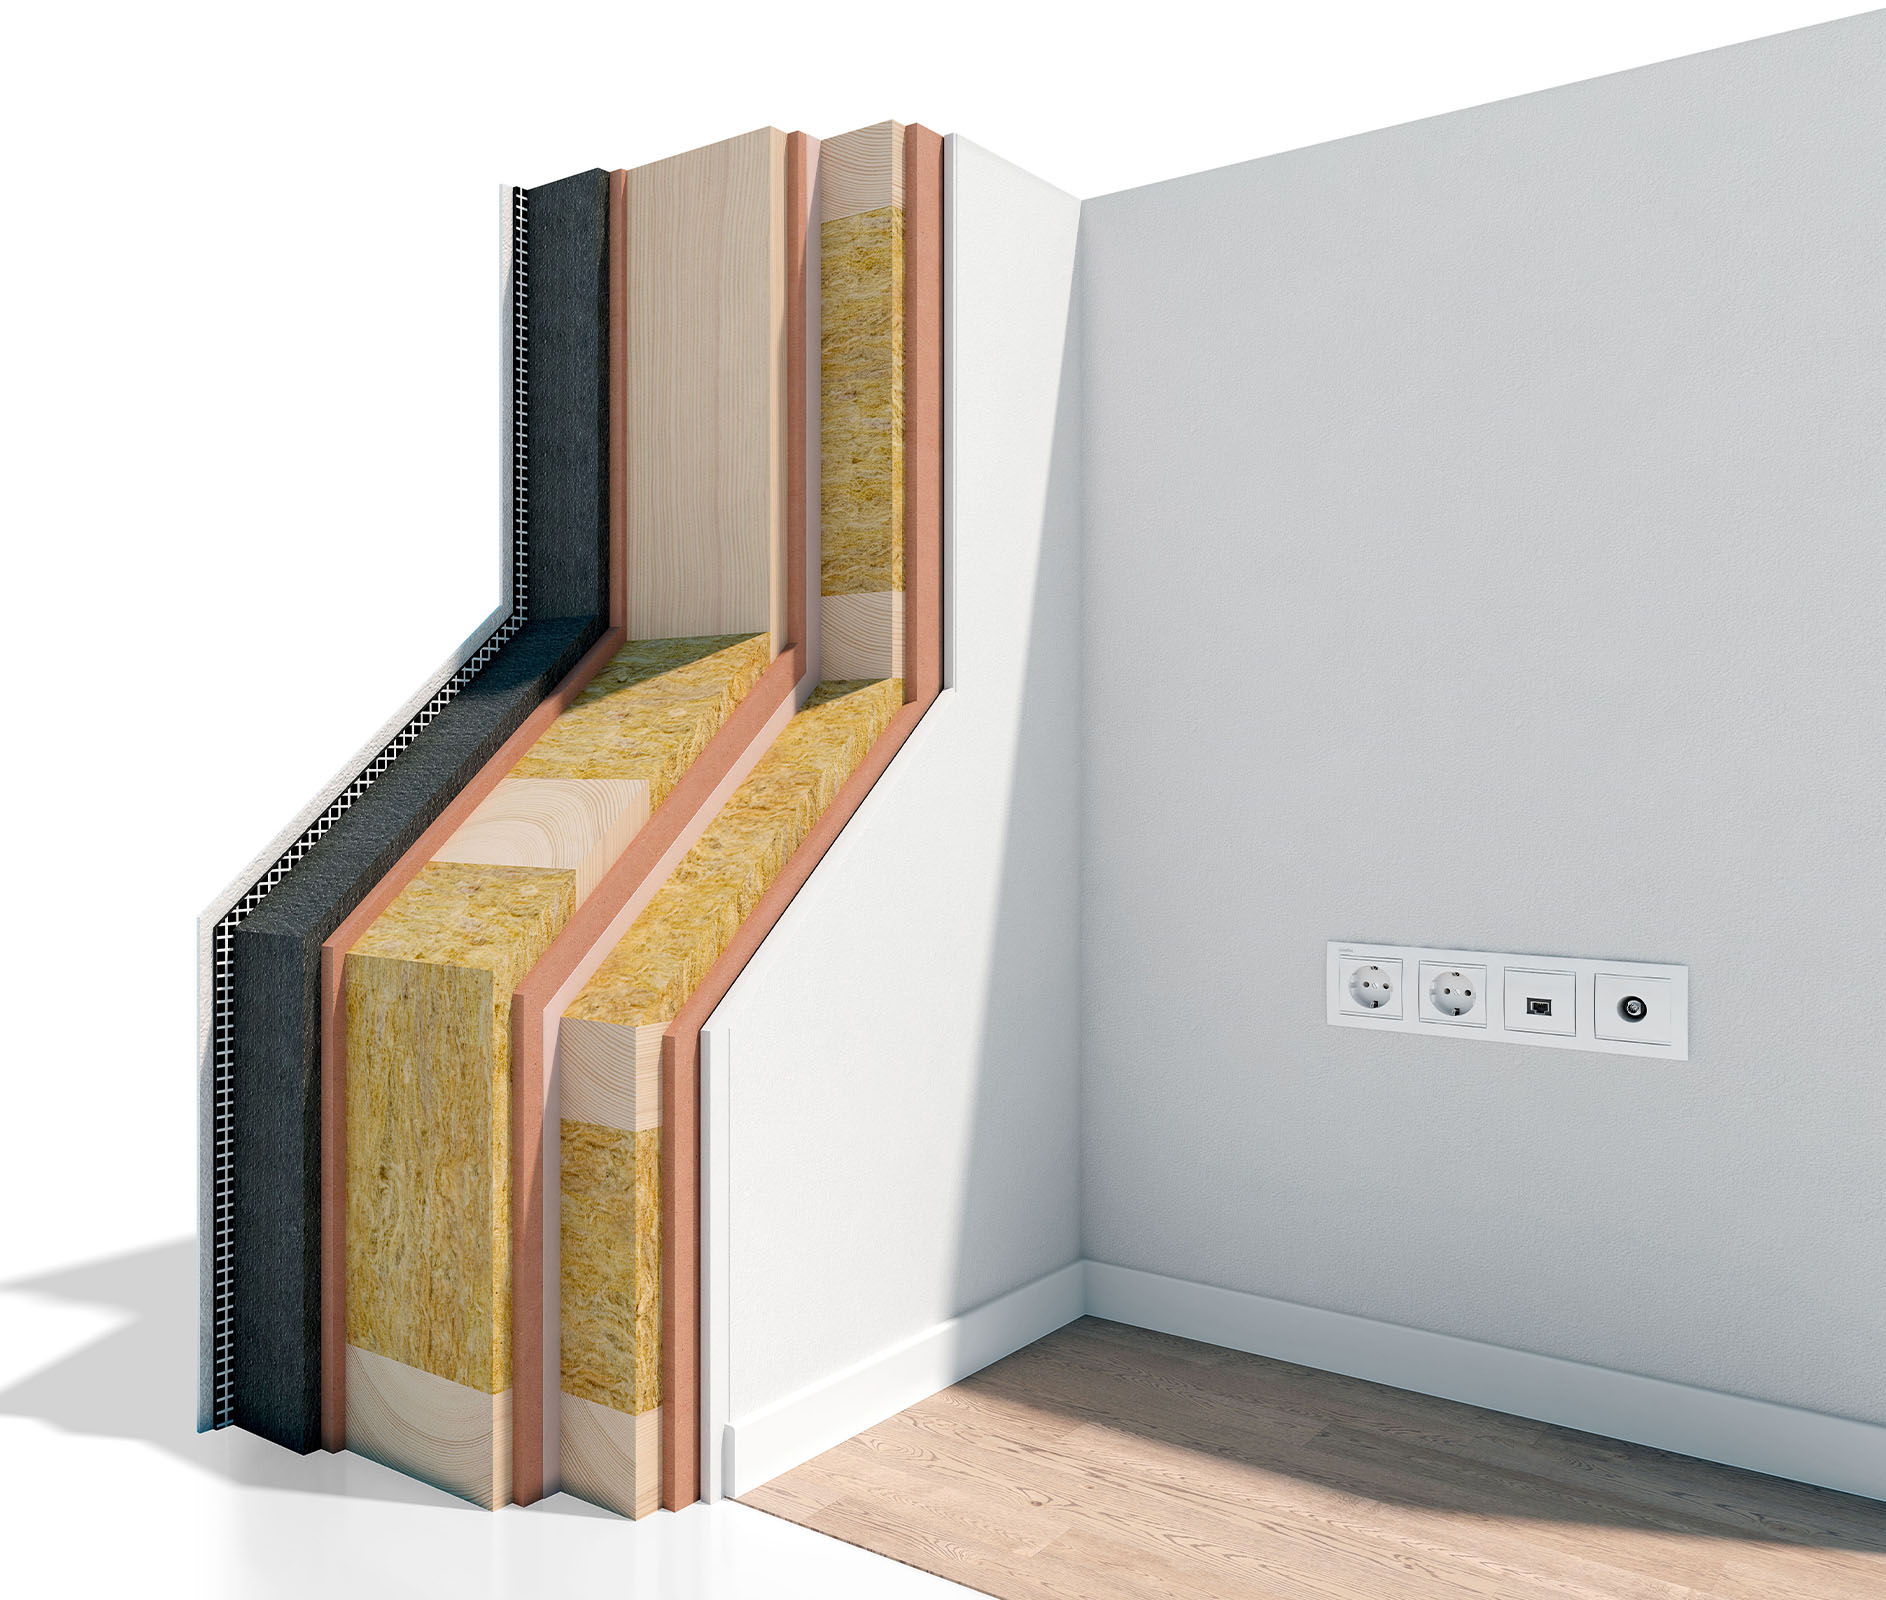 hausplaner kostenlos haus planen hausplanung with hausplaner kostenlos with hausplaner. Black Bedroom Furniture Sets. Home Design Ideas